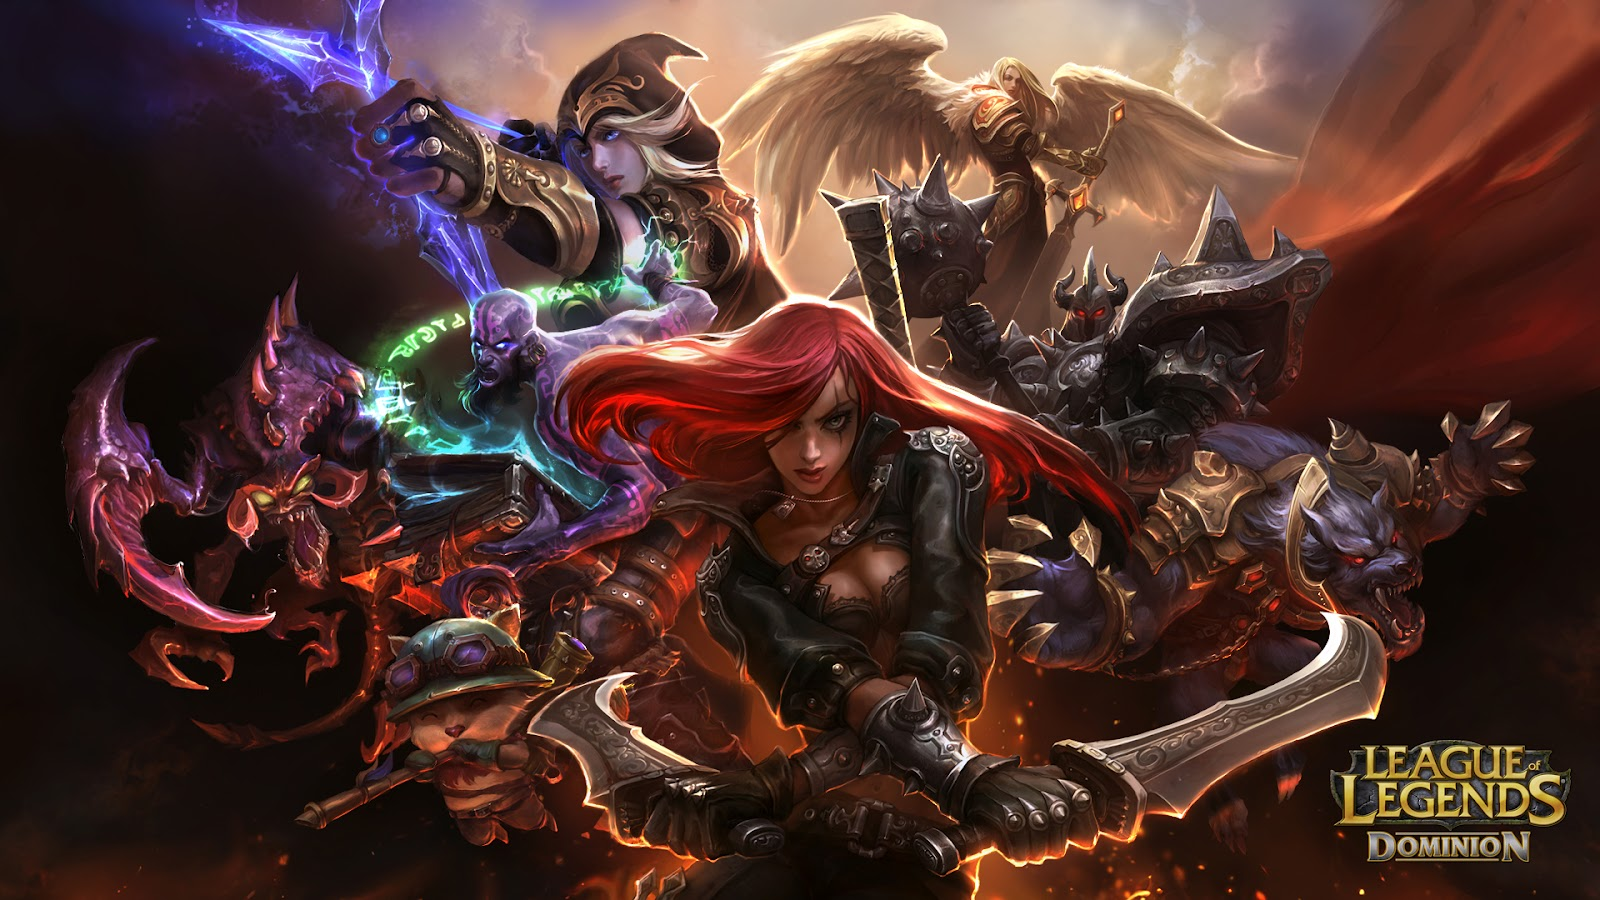 League Of Legends Wallpapers Team Katarina League Of Legends